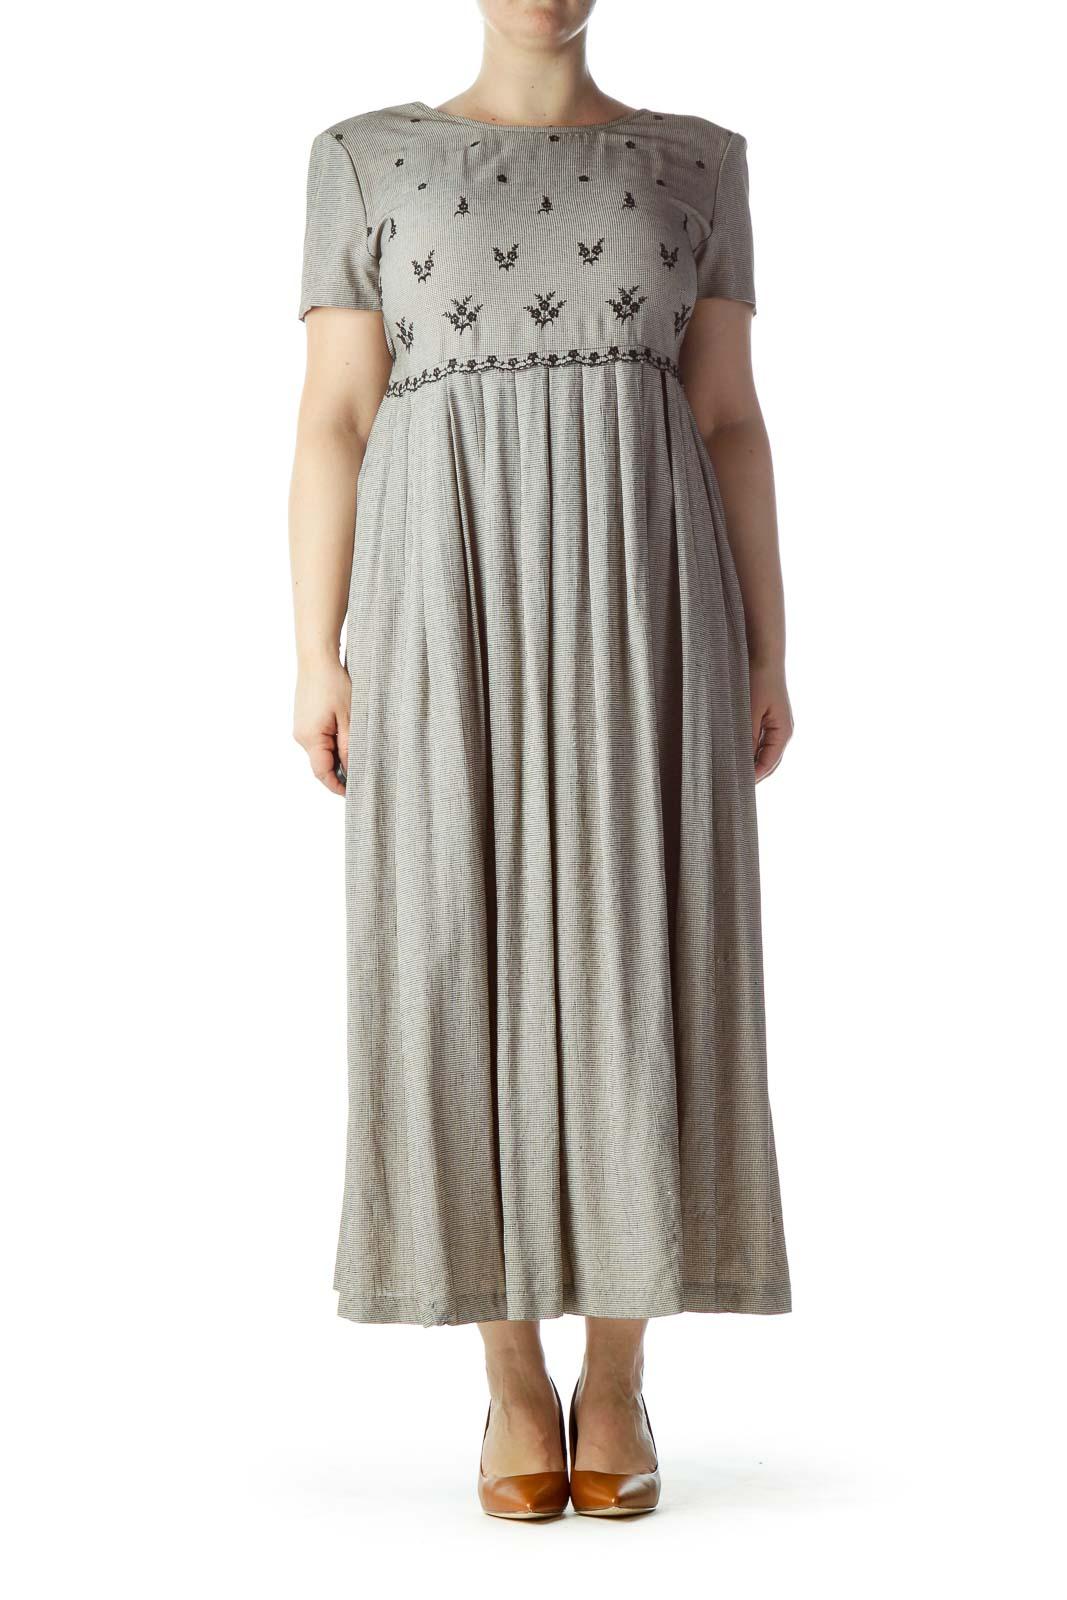 Black Houndstooth Midi Dress